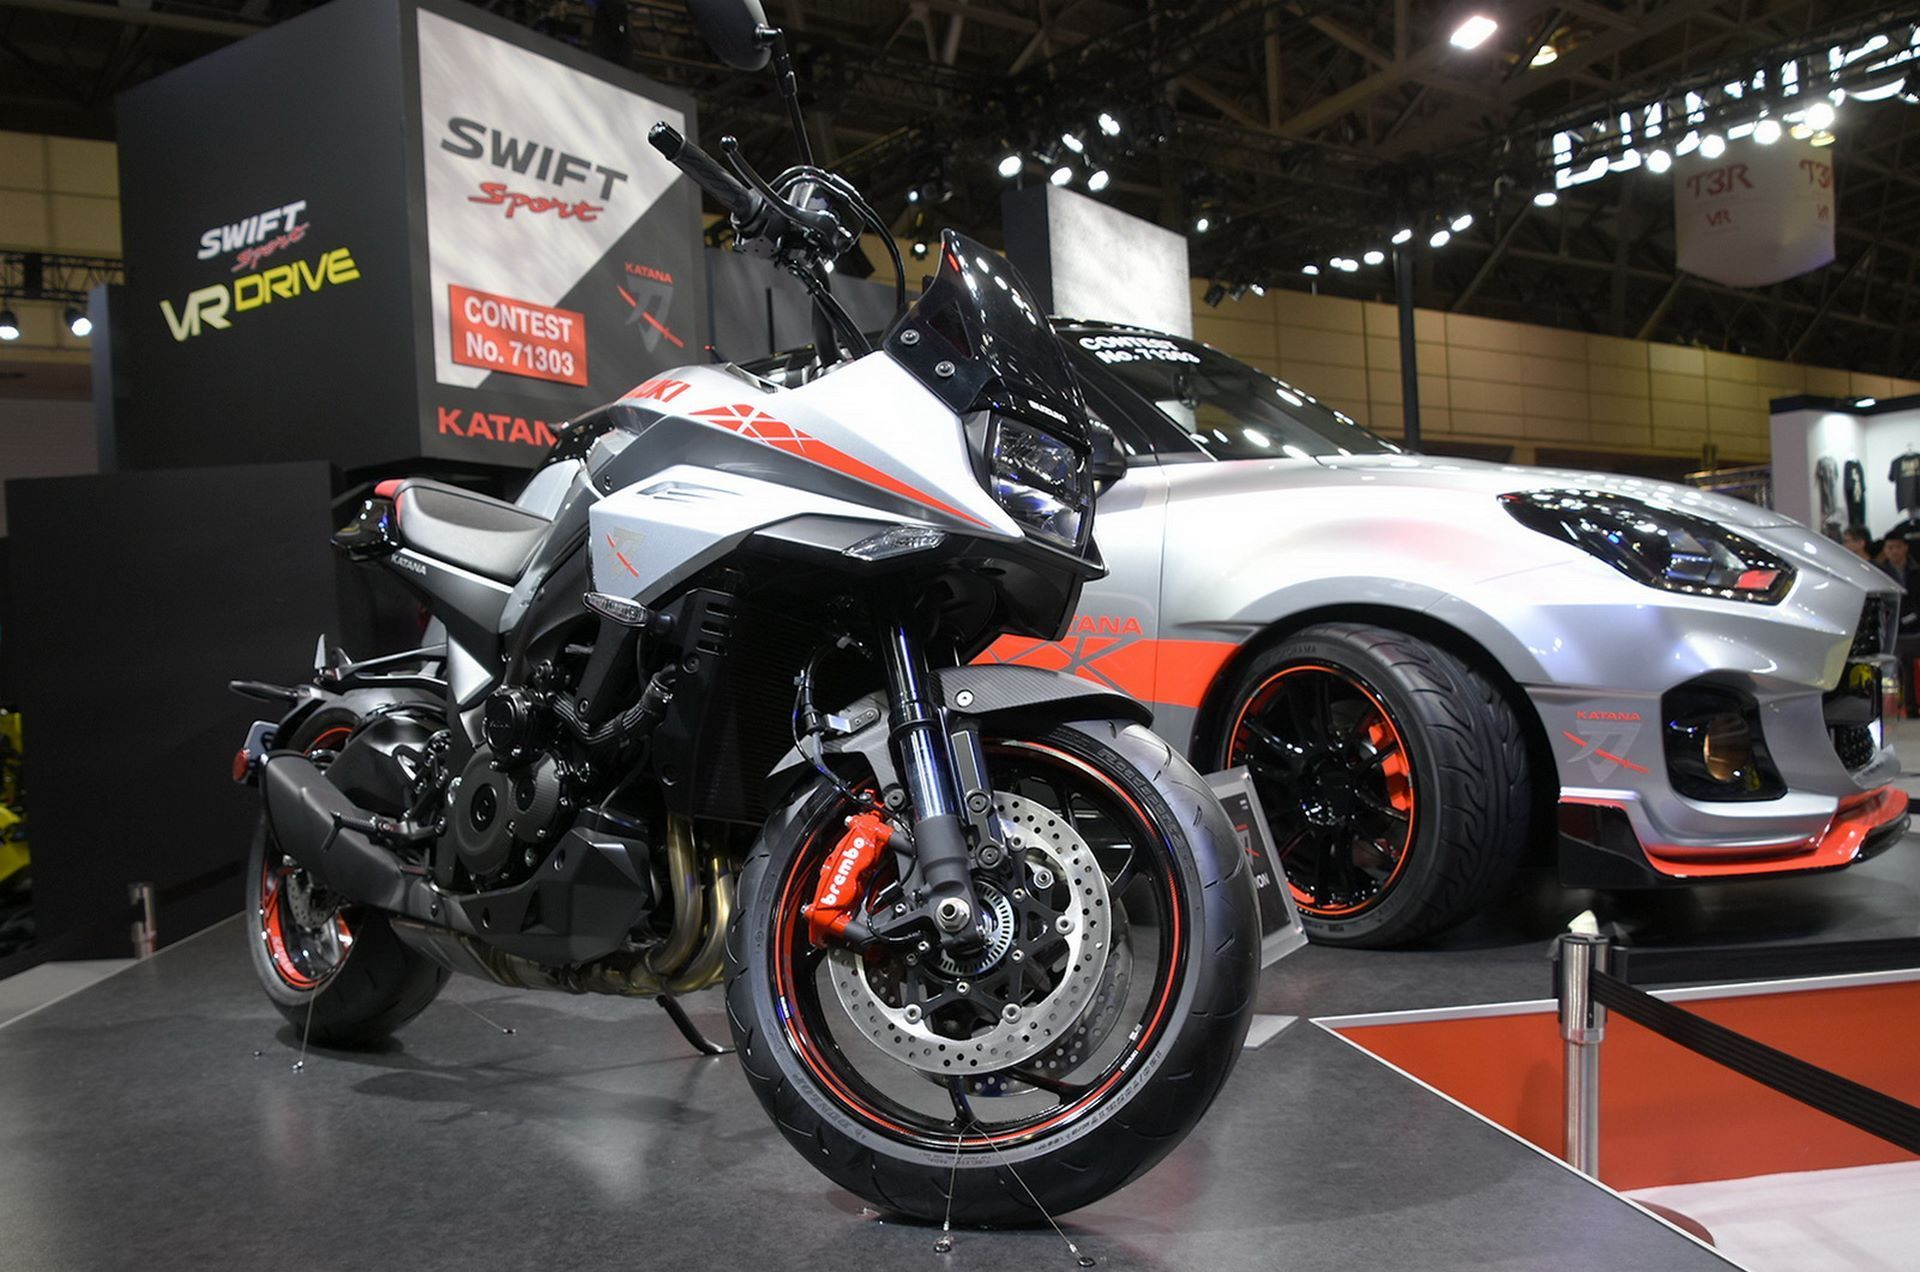 Suzuki-Swift-Sport-Katana-18